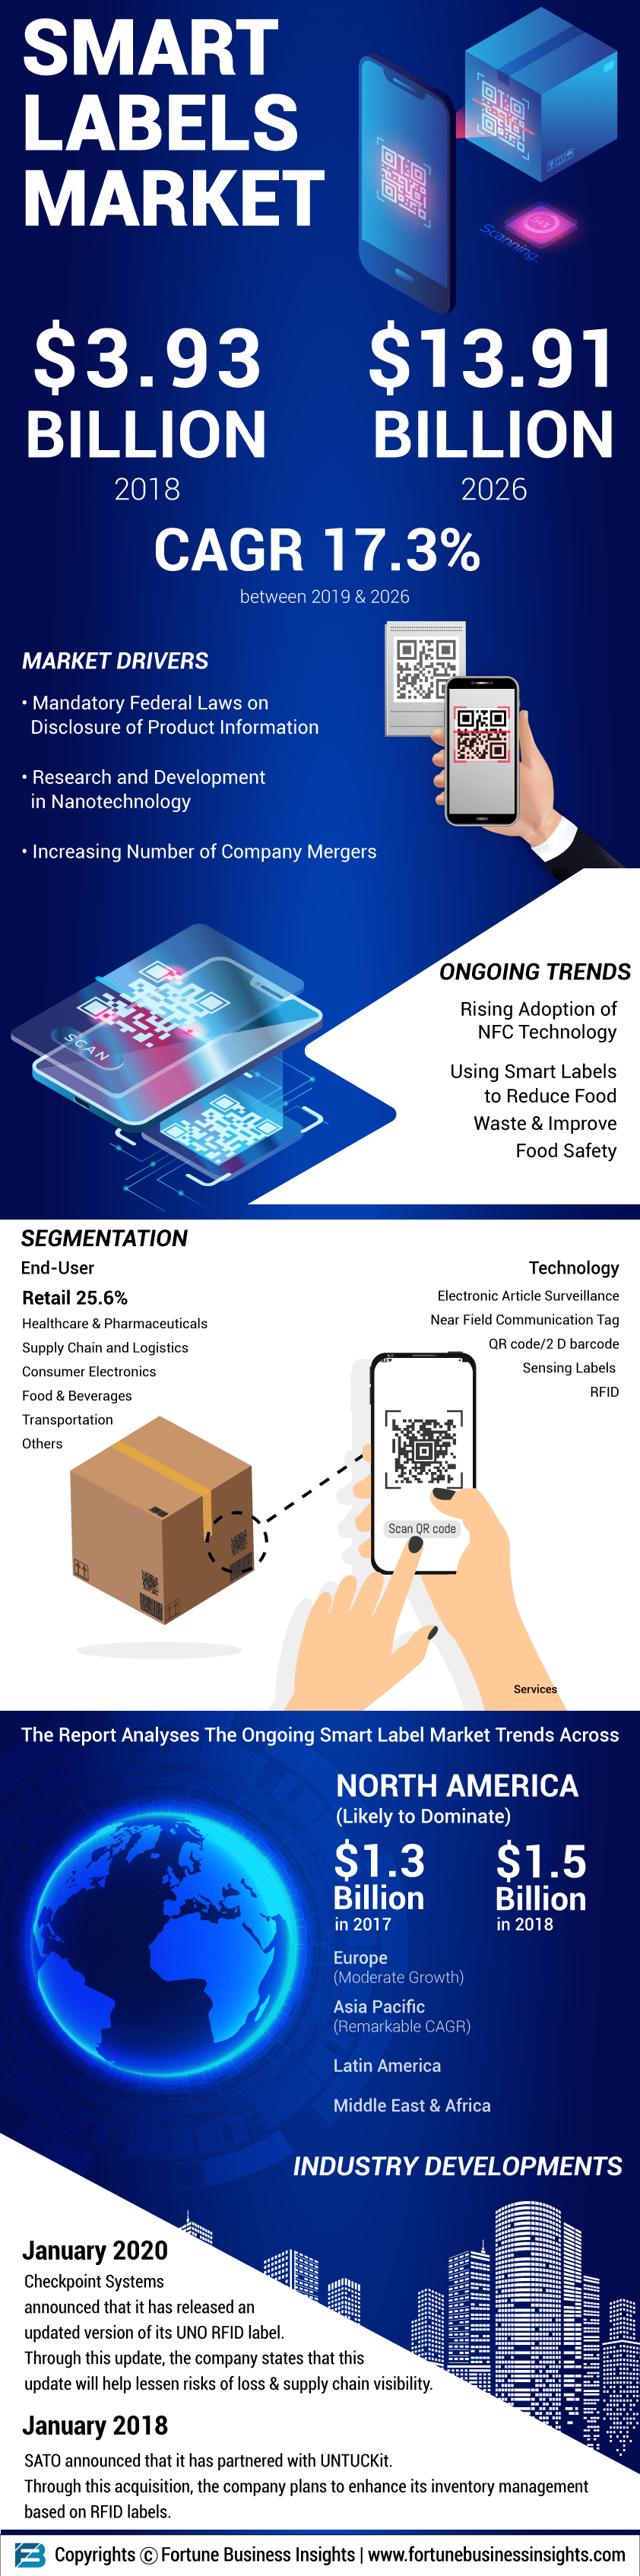 Smart Label Market